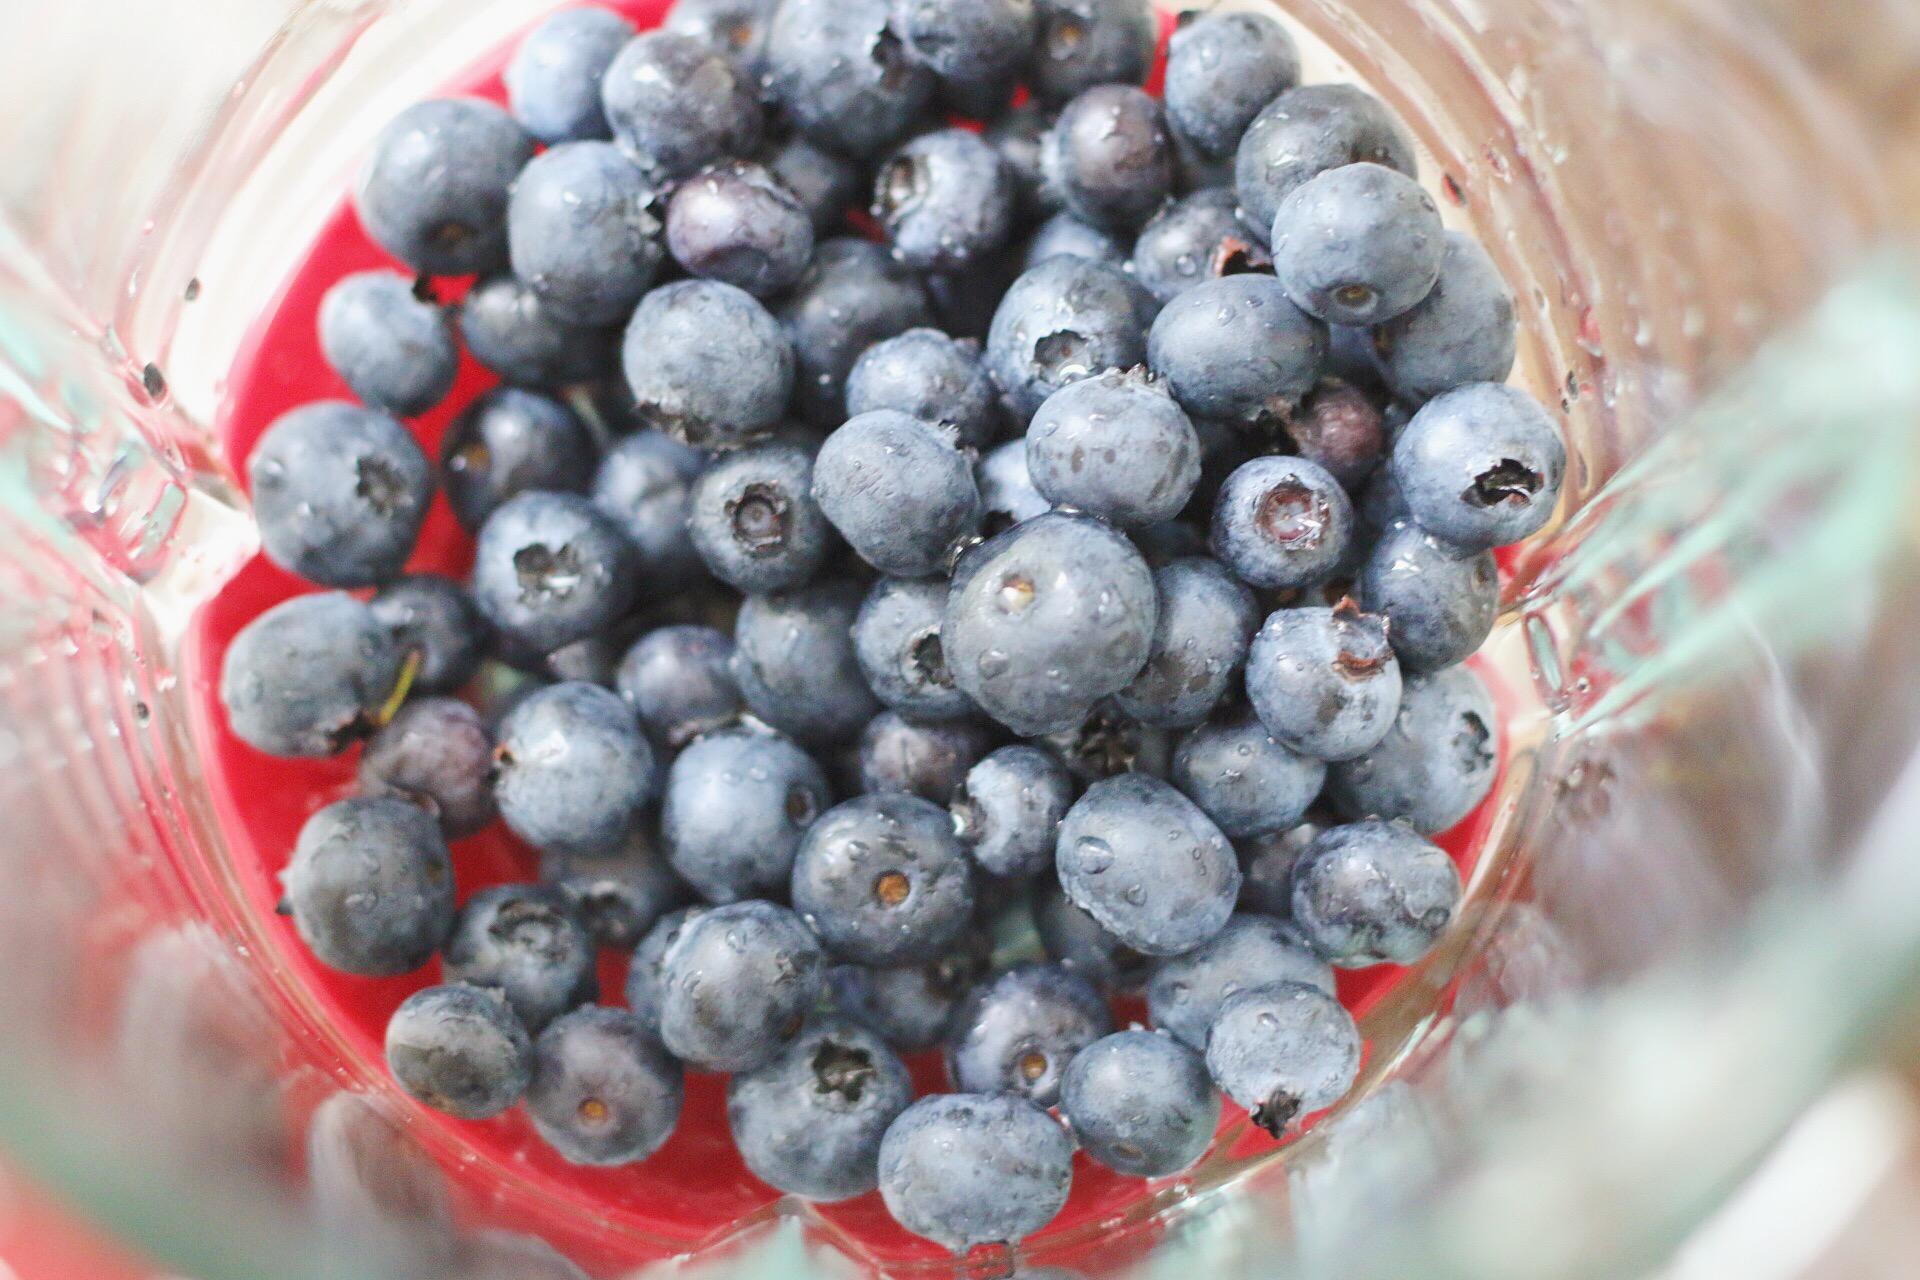 Puree blueberry. Add final layer after yogurt has frozen.